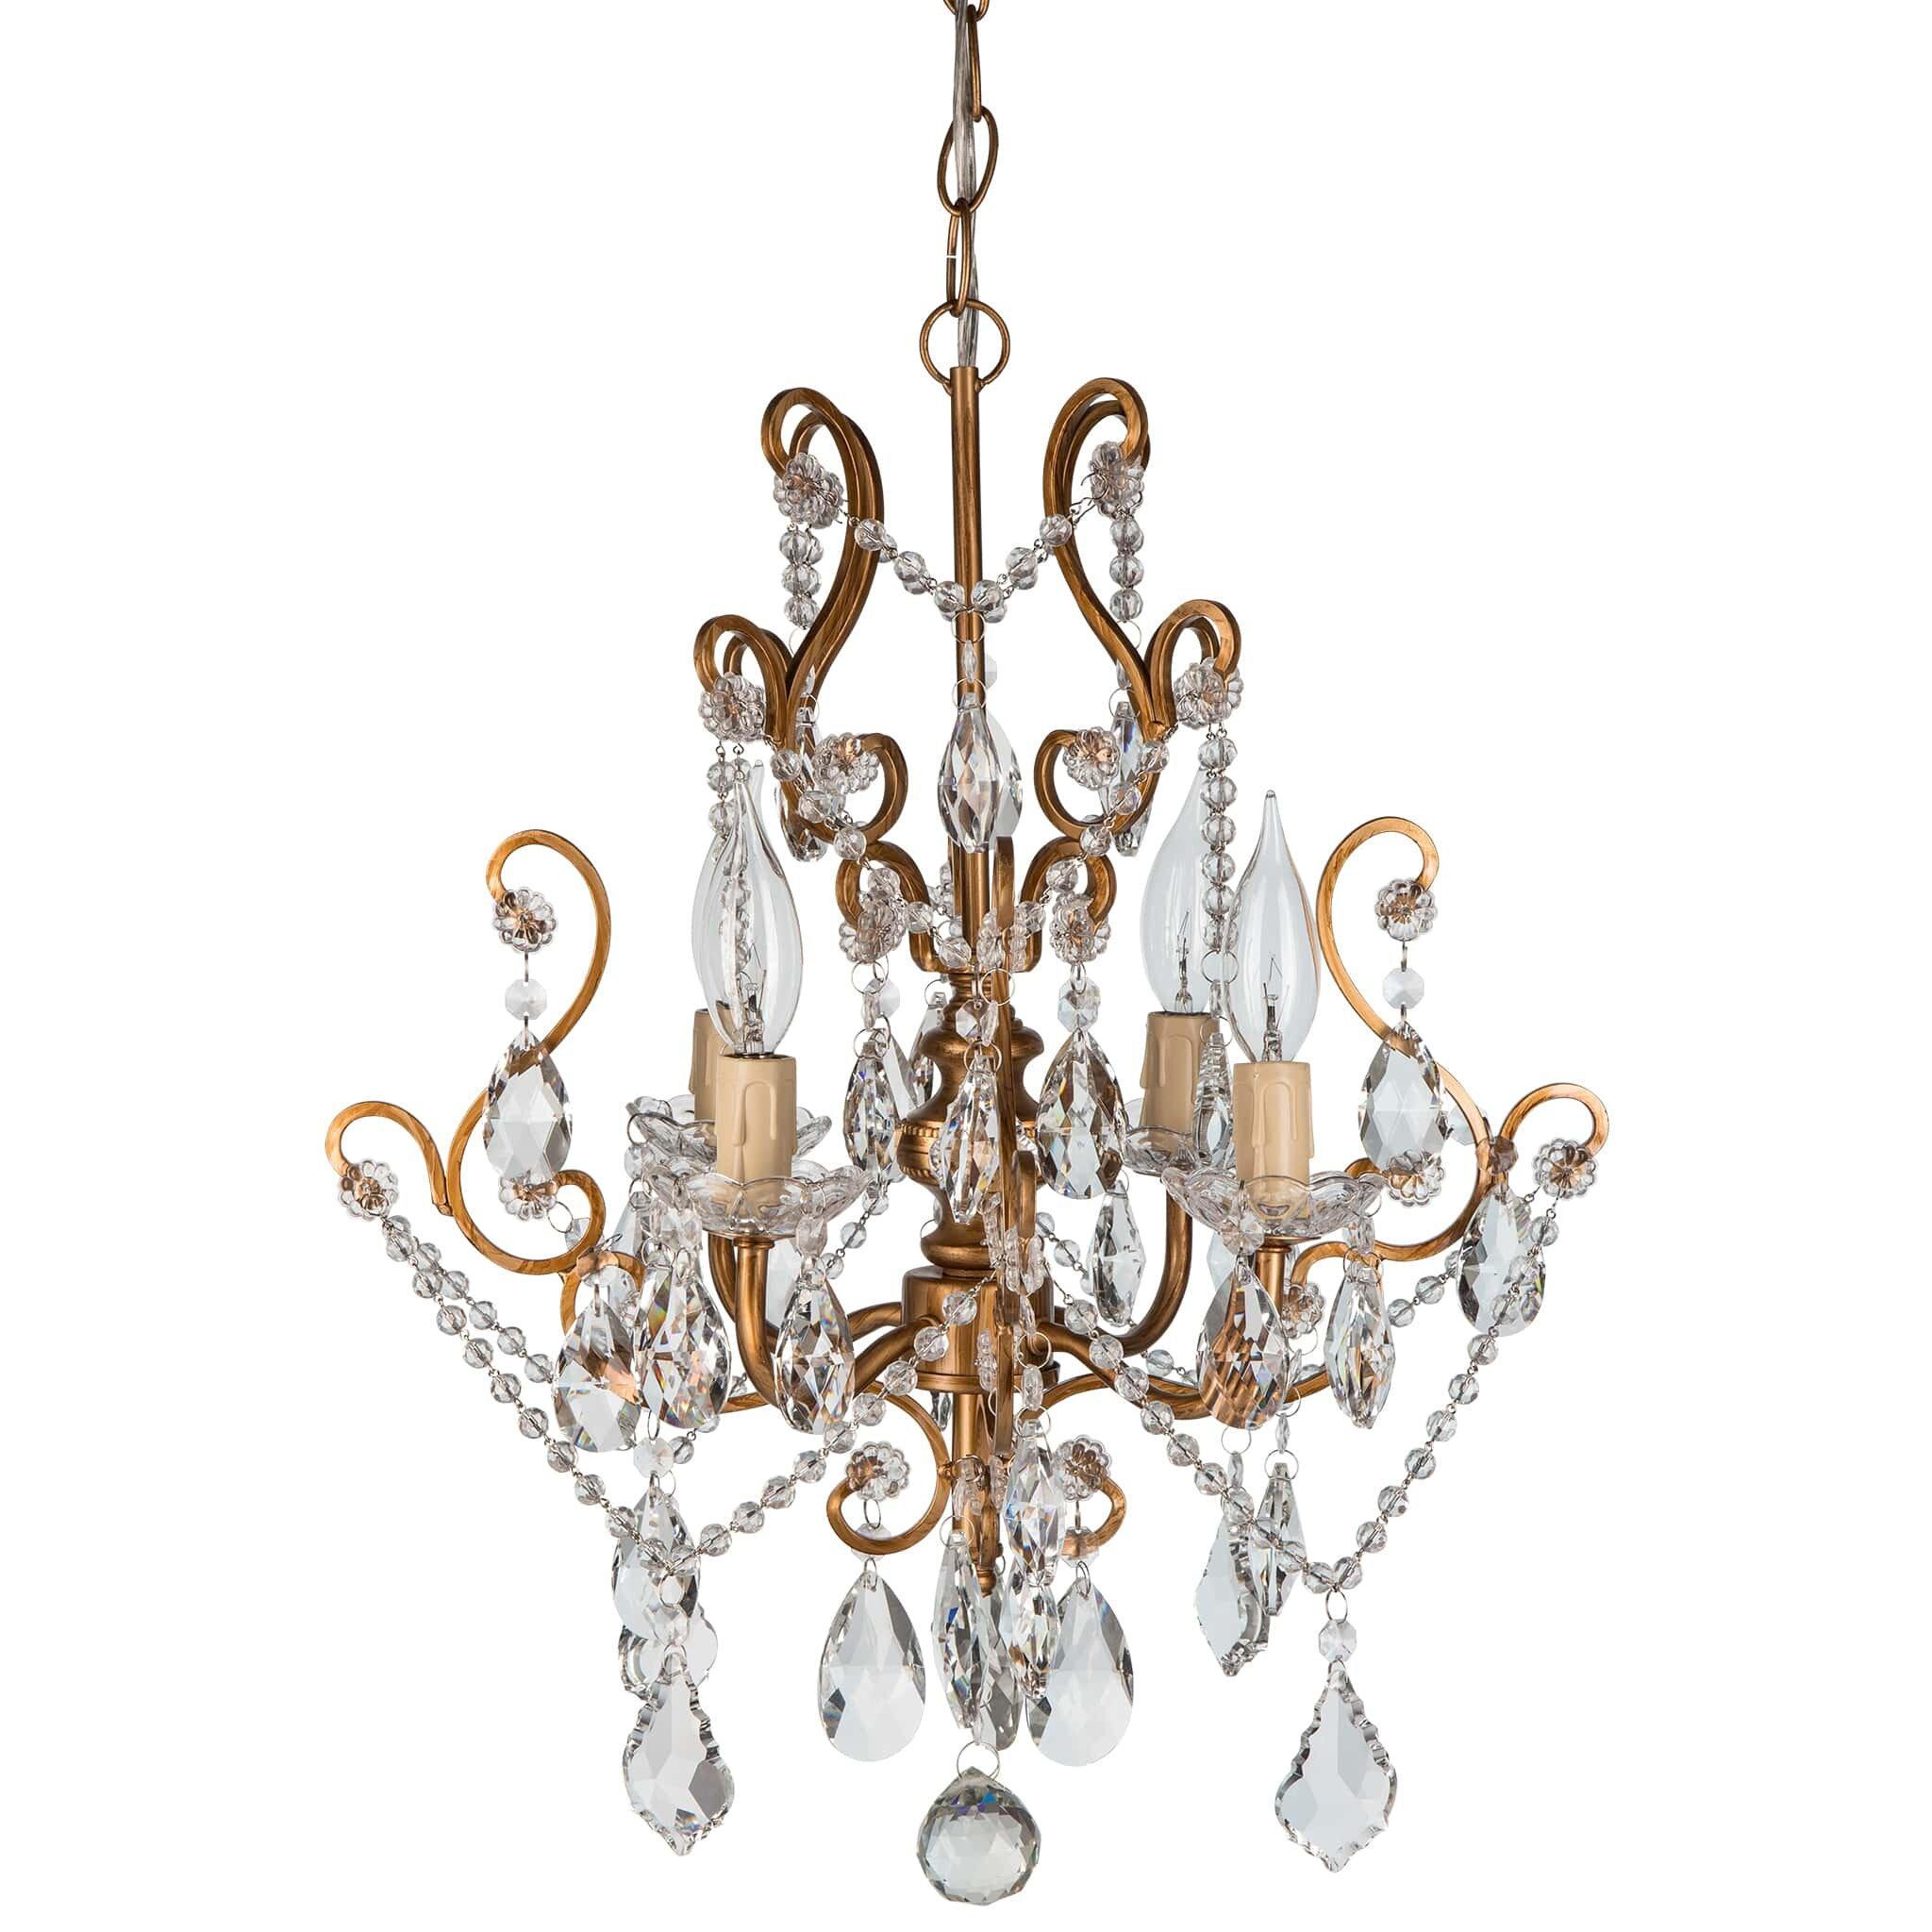 AmalfiDecor Tiffany 4Light Crystal Chandelier Reviews – Chrystal Chandelier